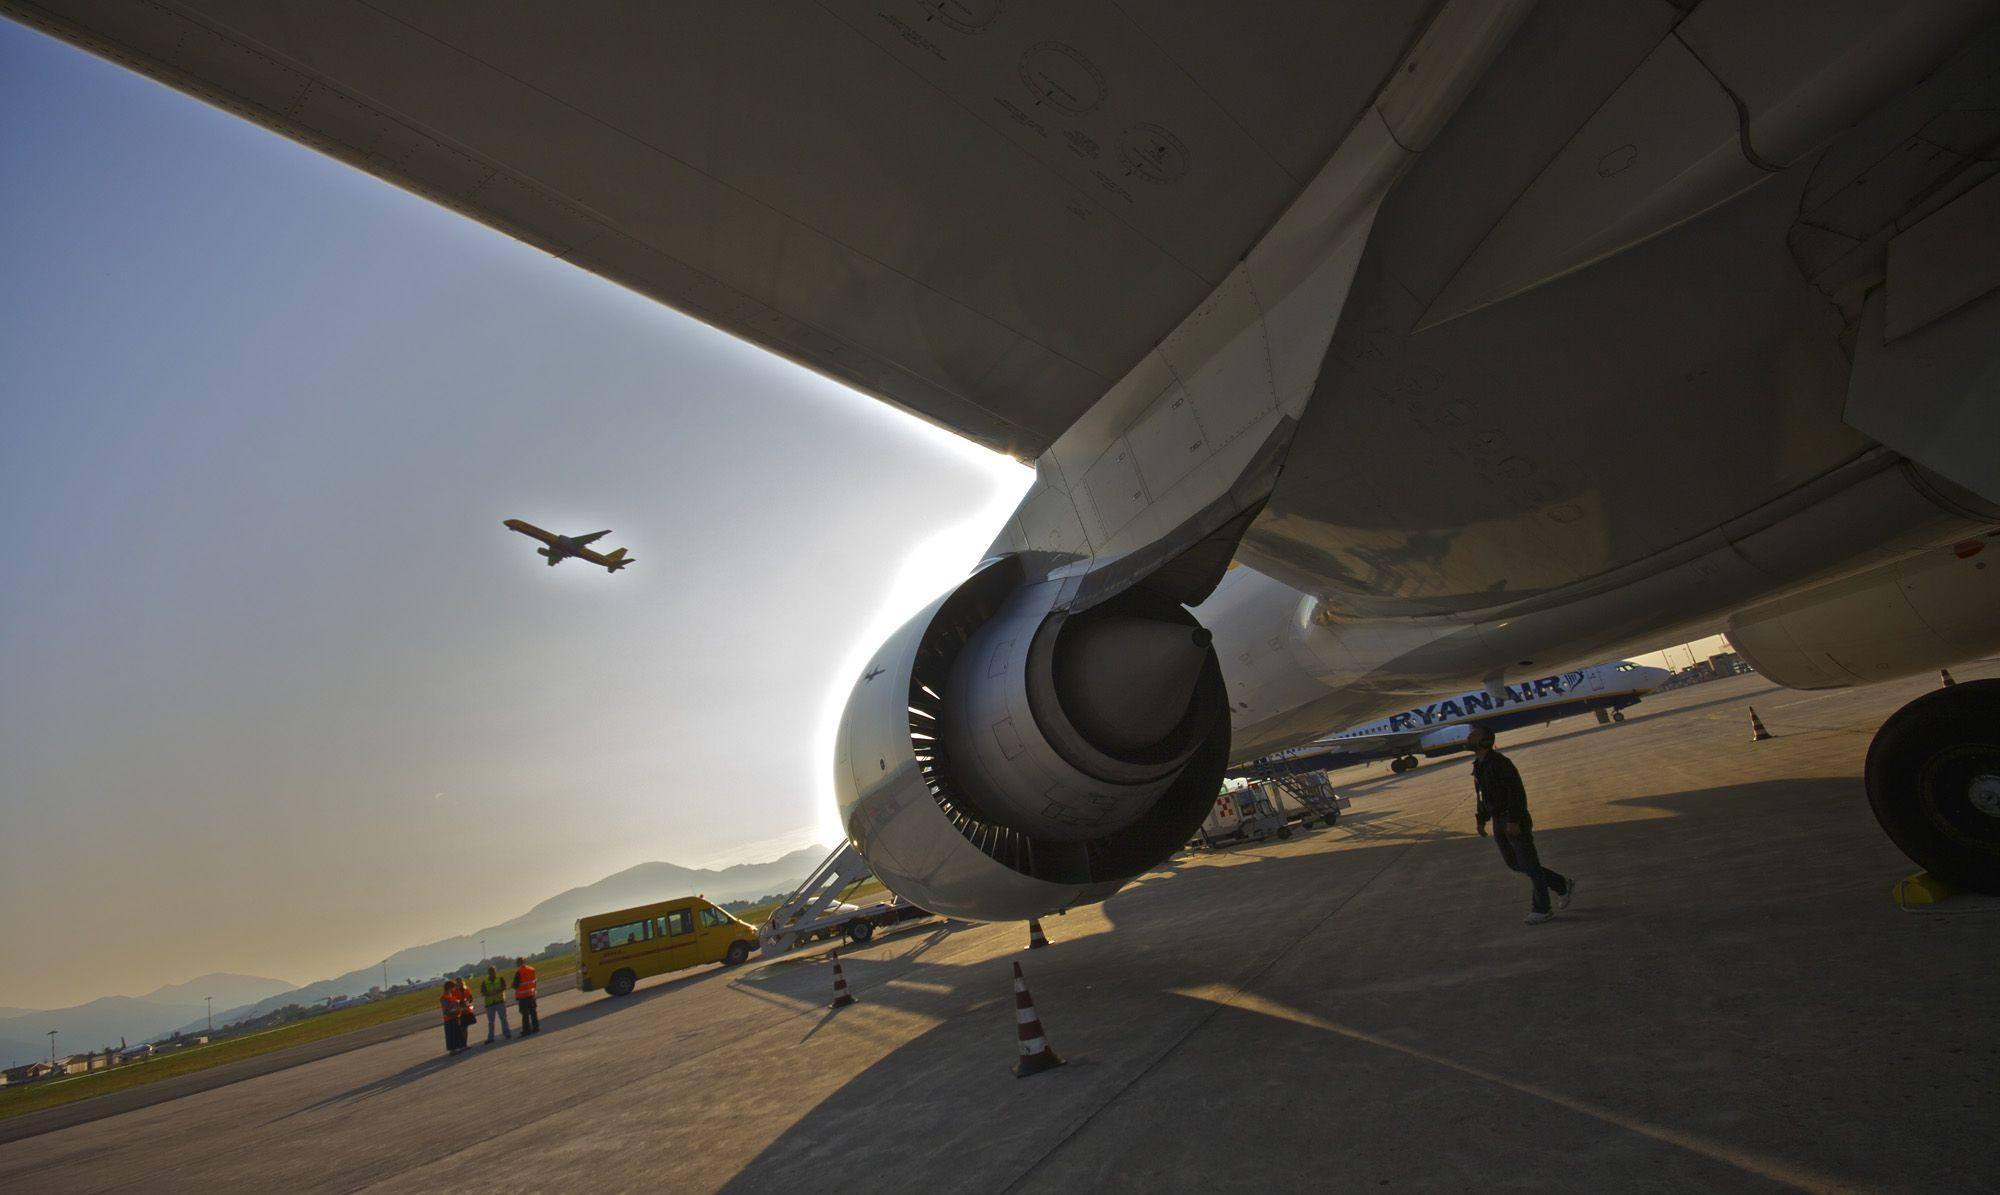 Aeroporto Orio Al Serio : Orio al serio airport stock photos orio al serio airport stock